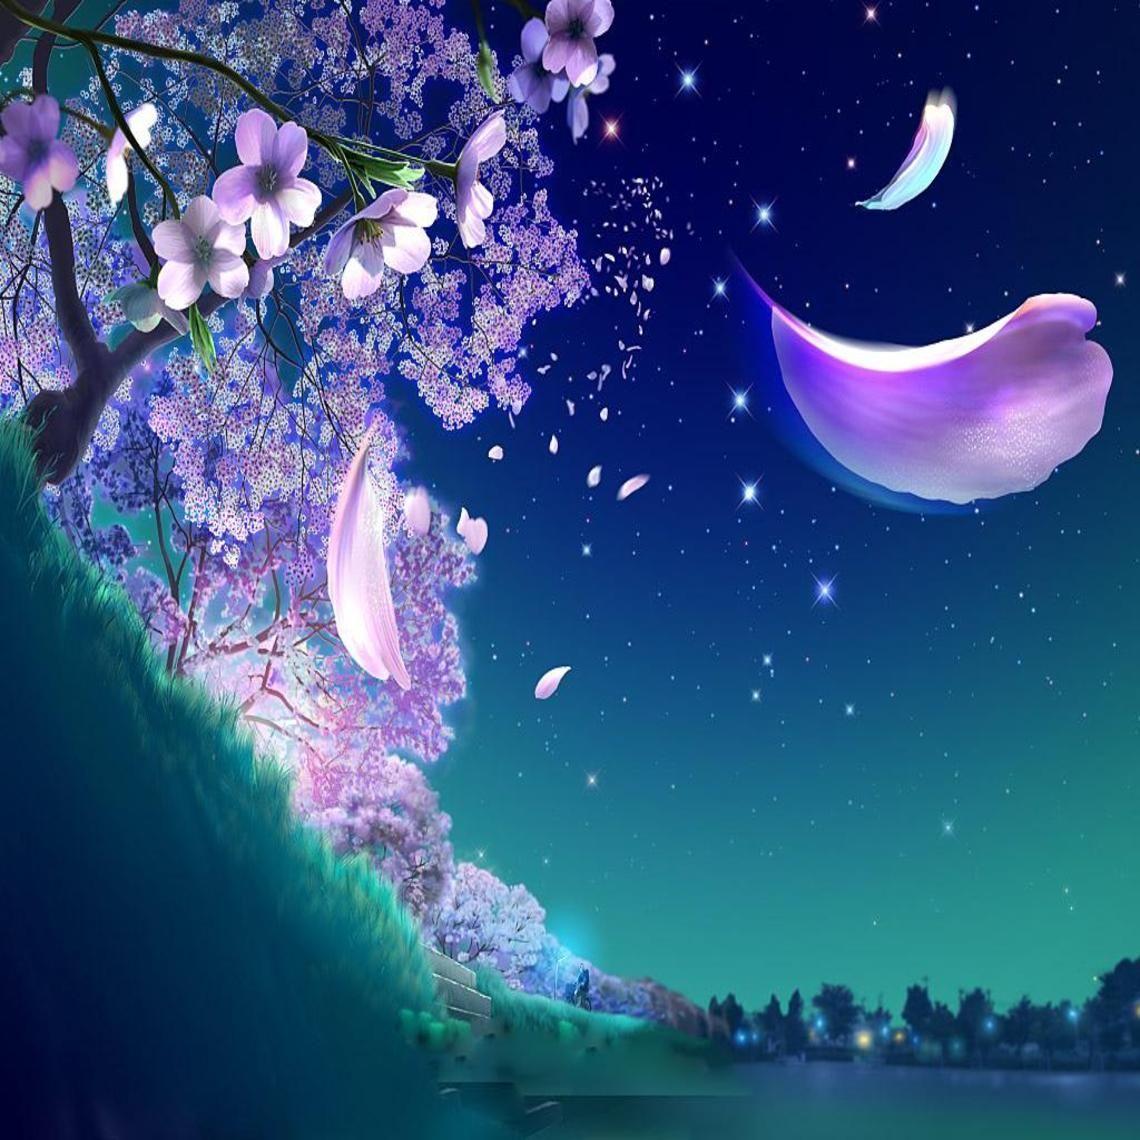 Magical Night's beauty